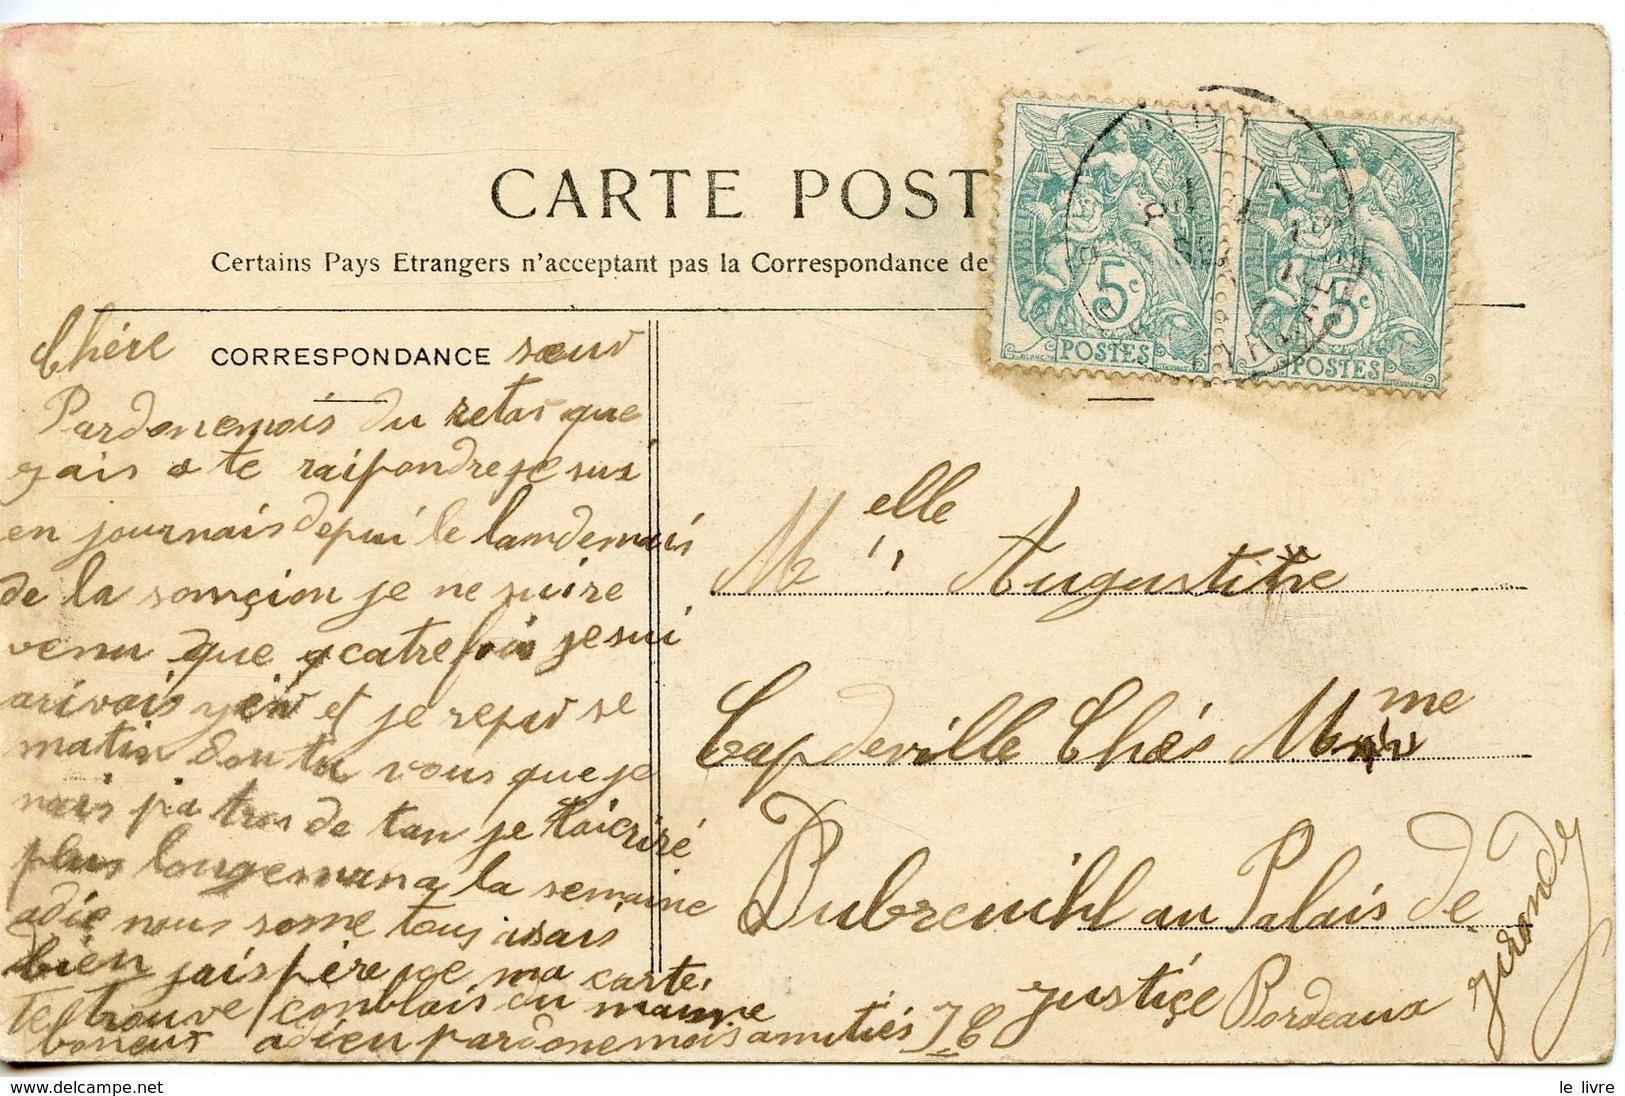 896. CPA 64 CARTE PRESQUE ENTIEREMENT DEDOUBLEE. BIARRITZ. GRANDE PLAGE. LES ANES EN LOCATION - Biarritz